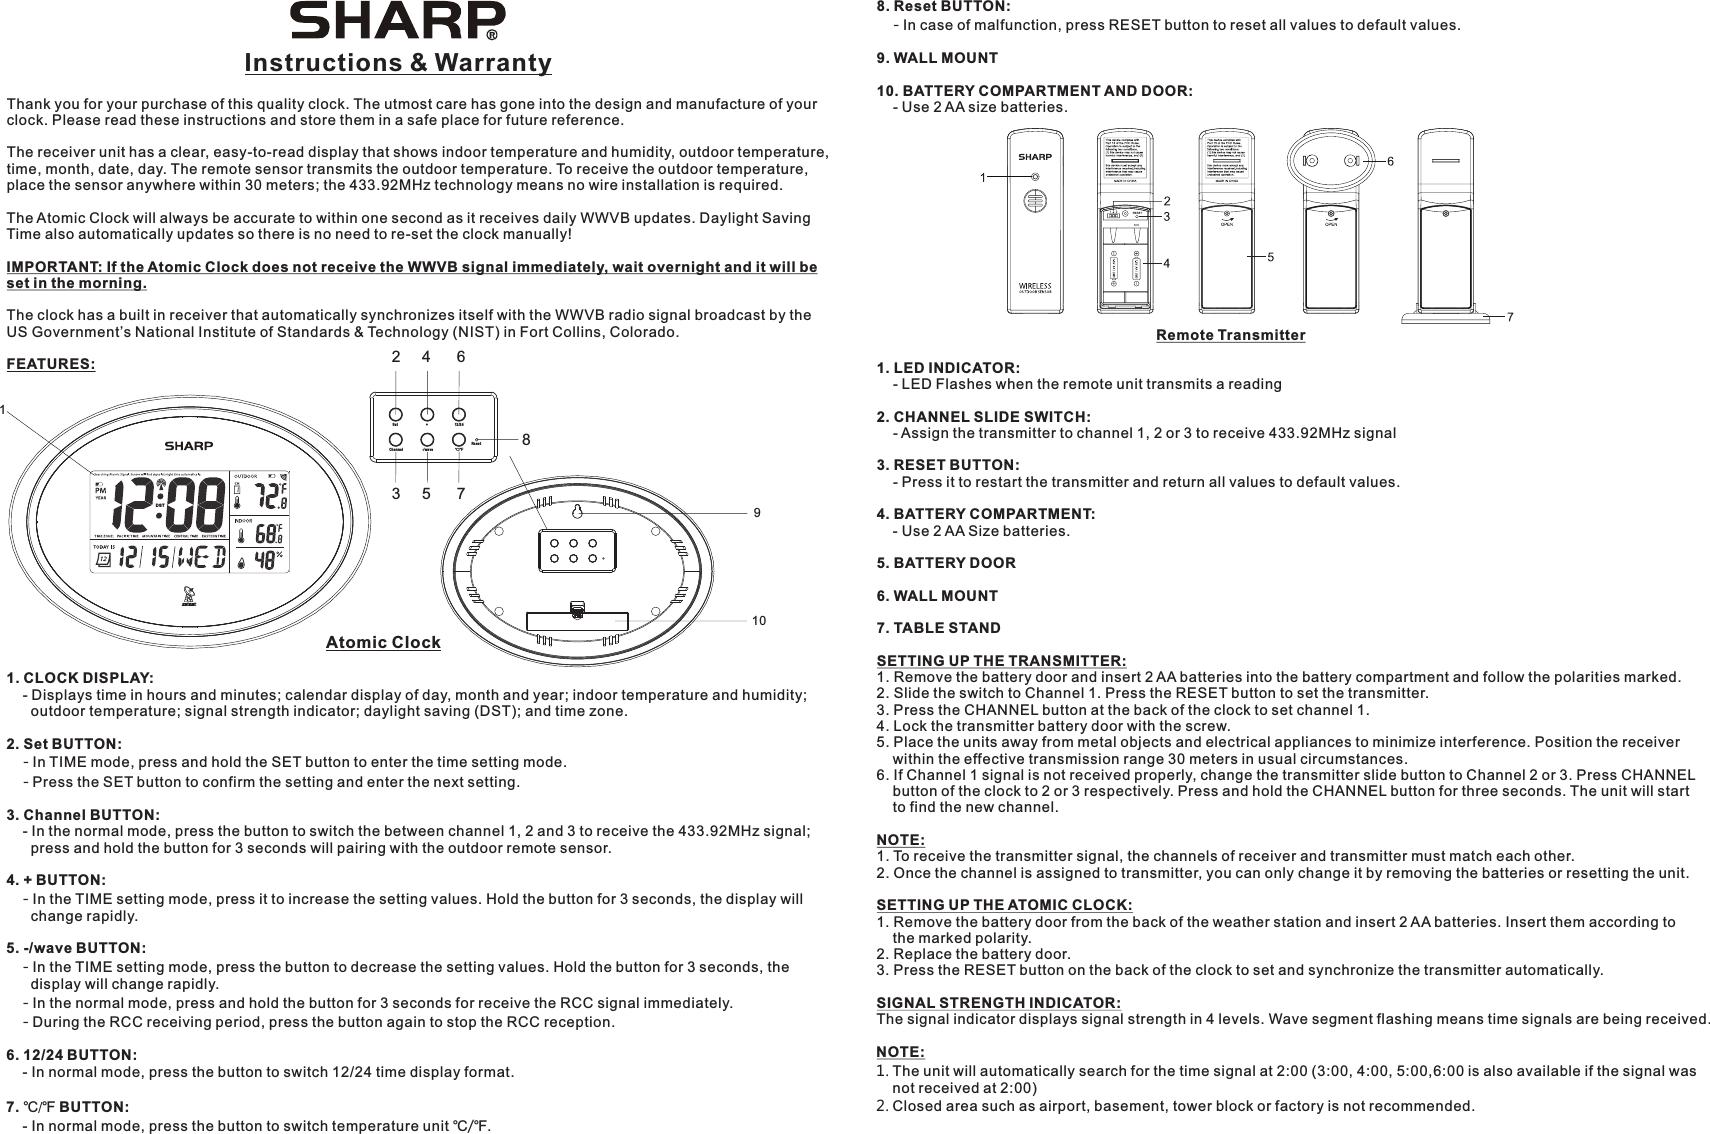 Acurite Digital Indoor Outdoor Temperature U0026 Humidity Manual Guide